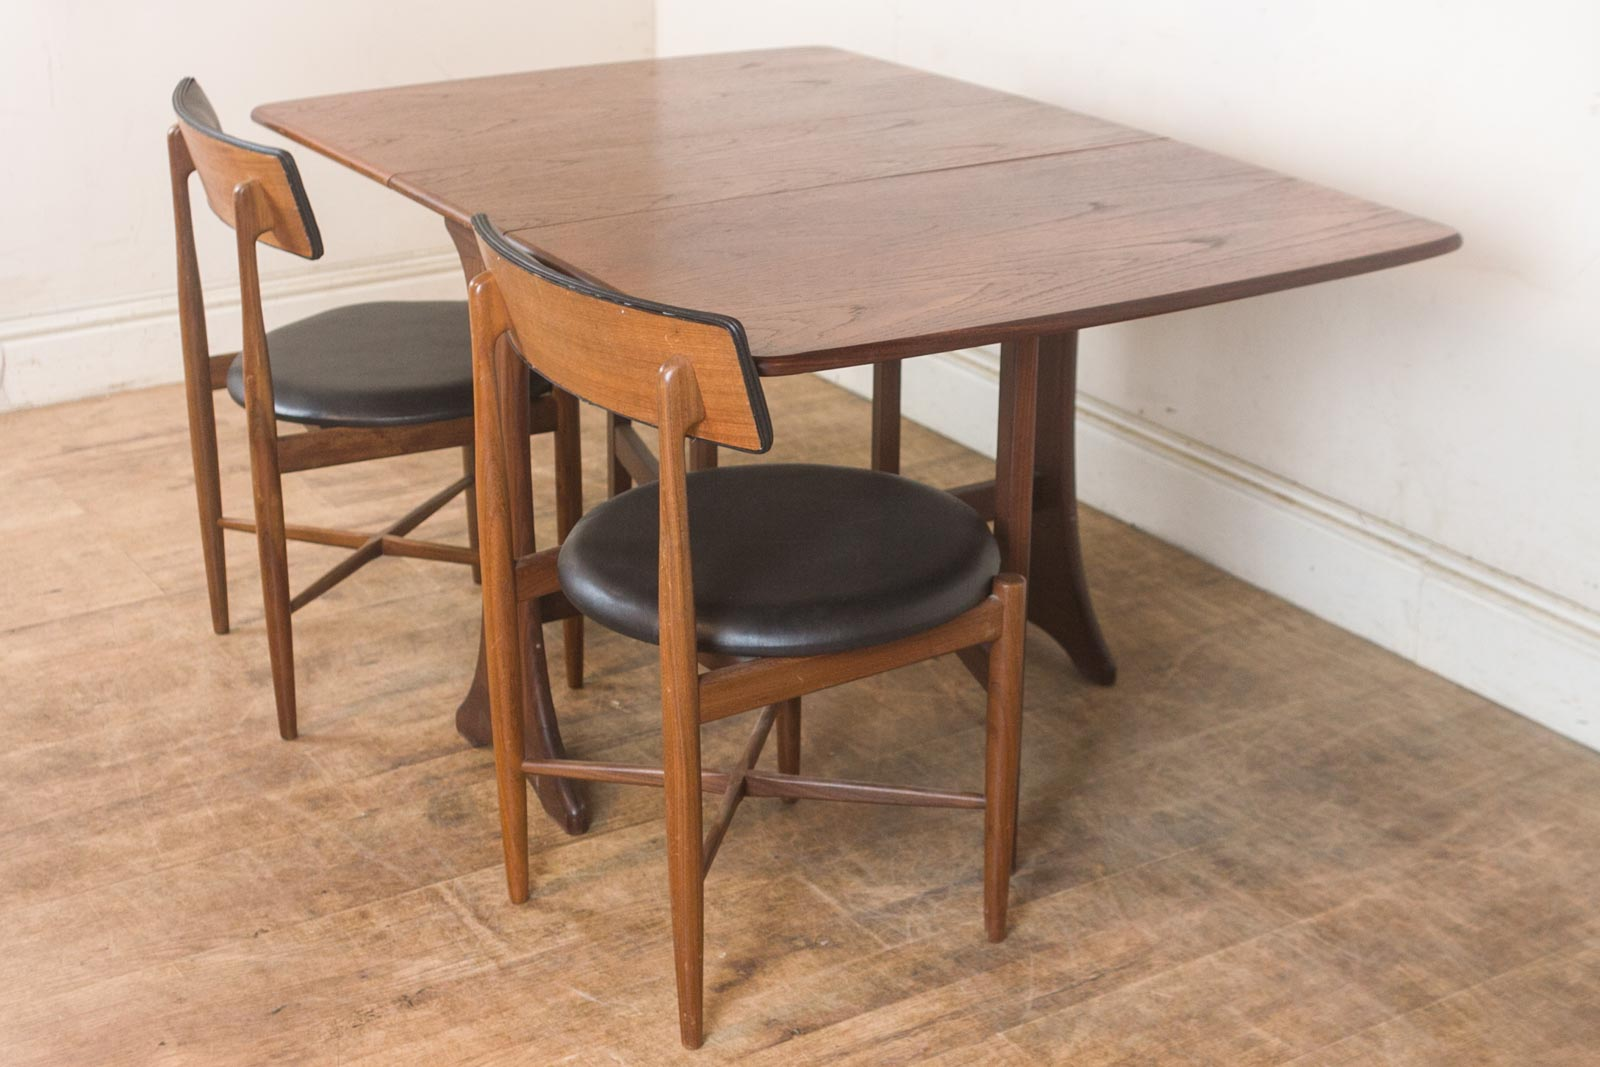 Vintage Retro G Plan Teak Drop Leaf Dining Table And 2 Fresco Chairs EBay